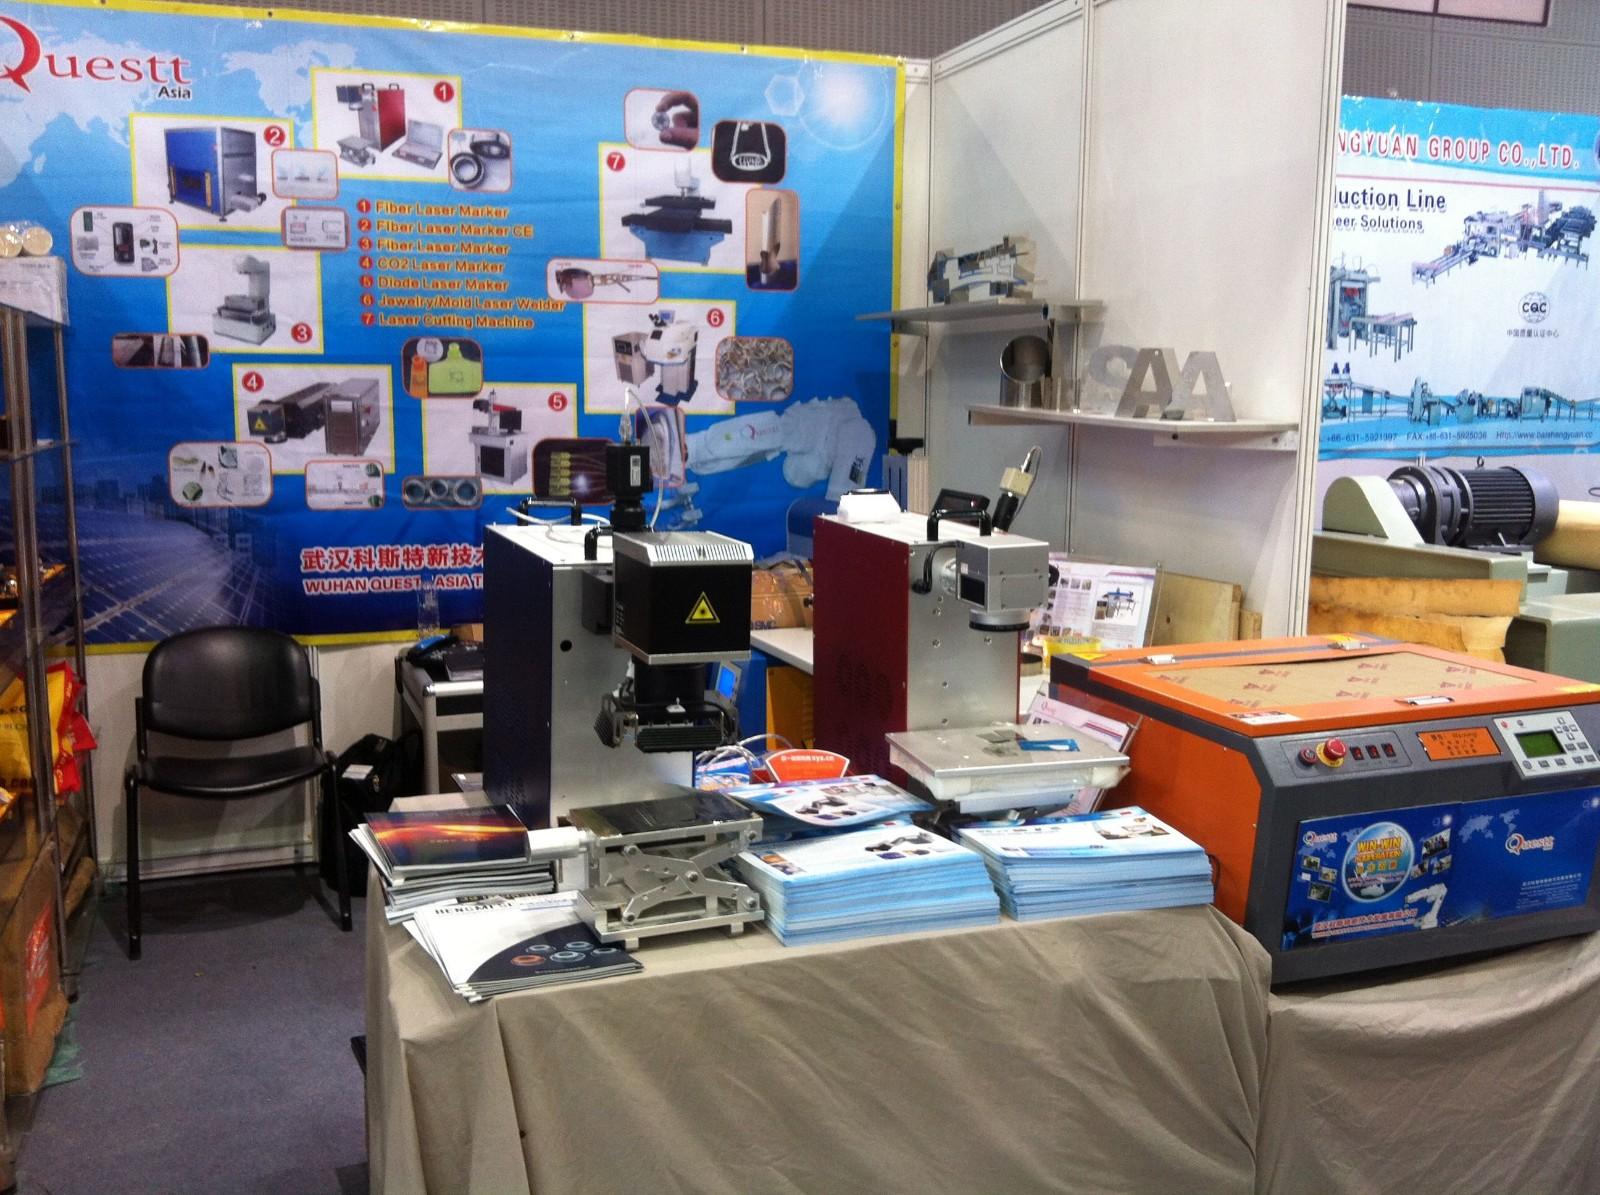 news-Guangzhou Exhibition-QUESTT-img